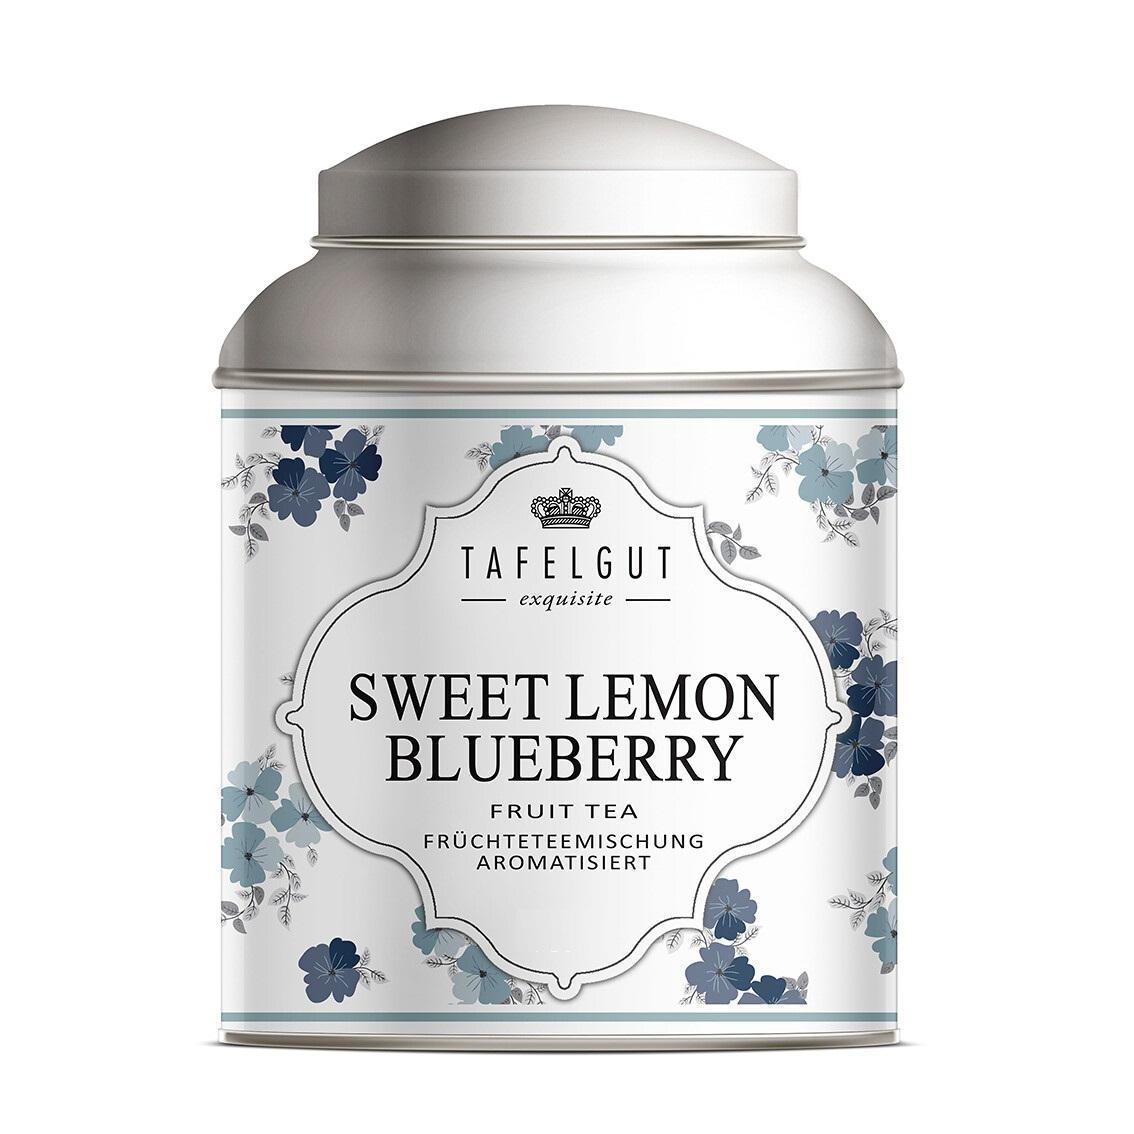 TAFELGUT Ovocný čaj Sweet Lemon Blueberry - 40g, modrá barva, kov